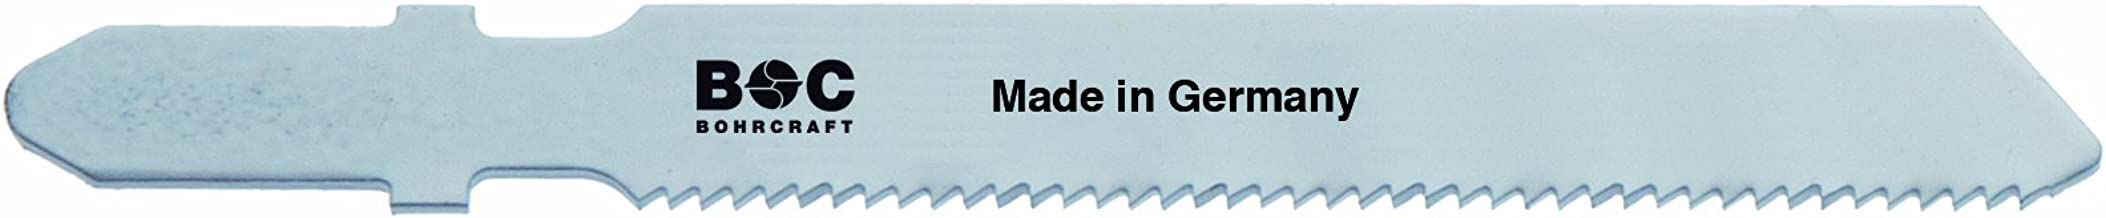 Bohrcraft–Sierra de calar BI de metal, dientes triscado, ZT 1,8–2,5x 75mm Longitud en 5Ondulado BC SB de tarjeta, 1pieza, 19651600002